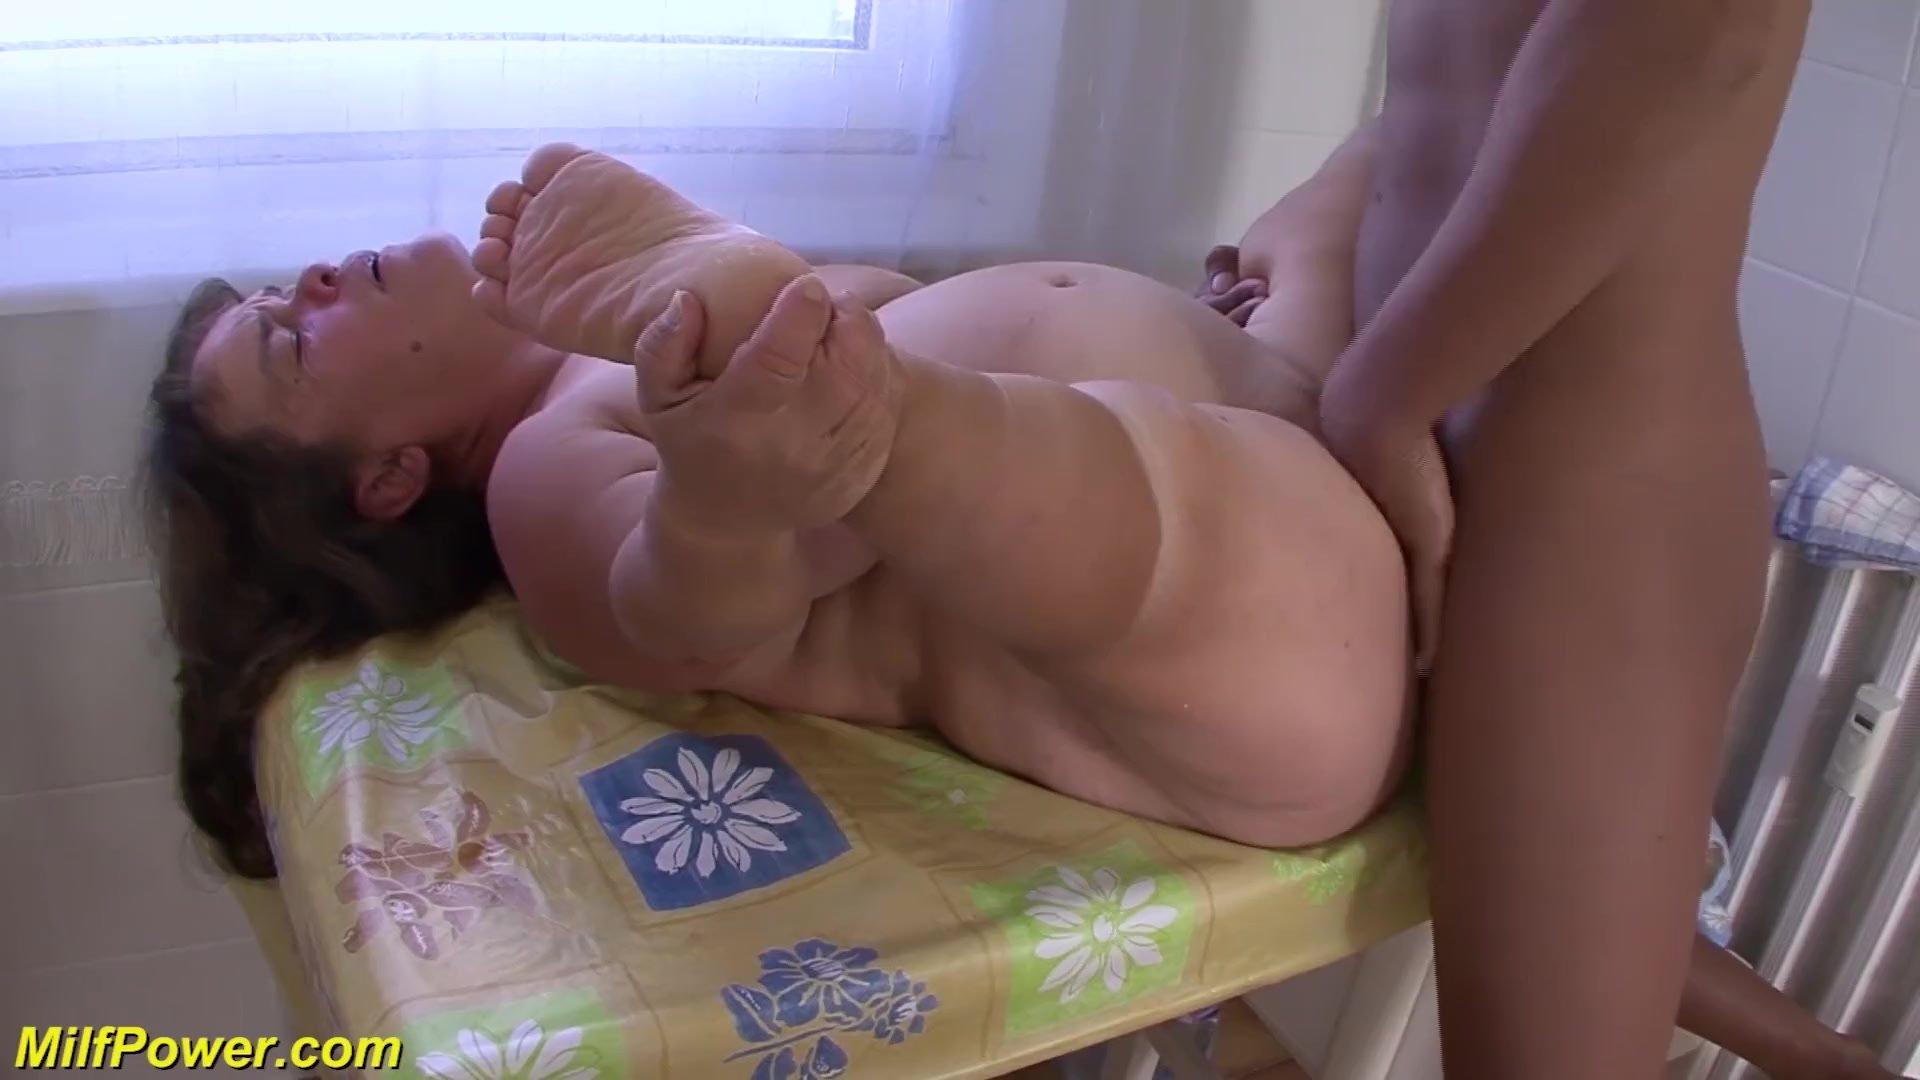 Cumshot/cock sucking/busty cock mature fucked big